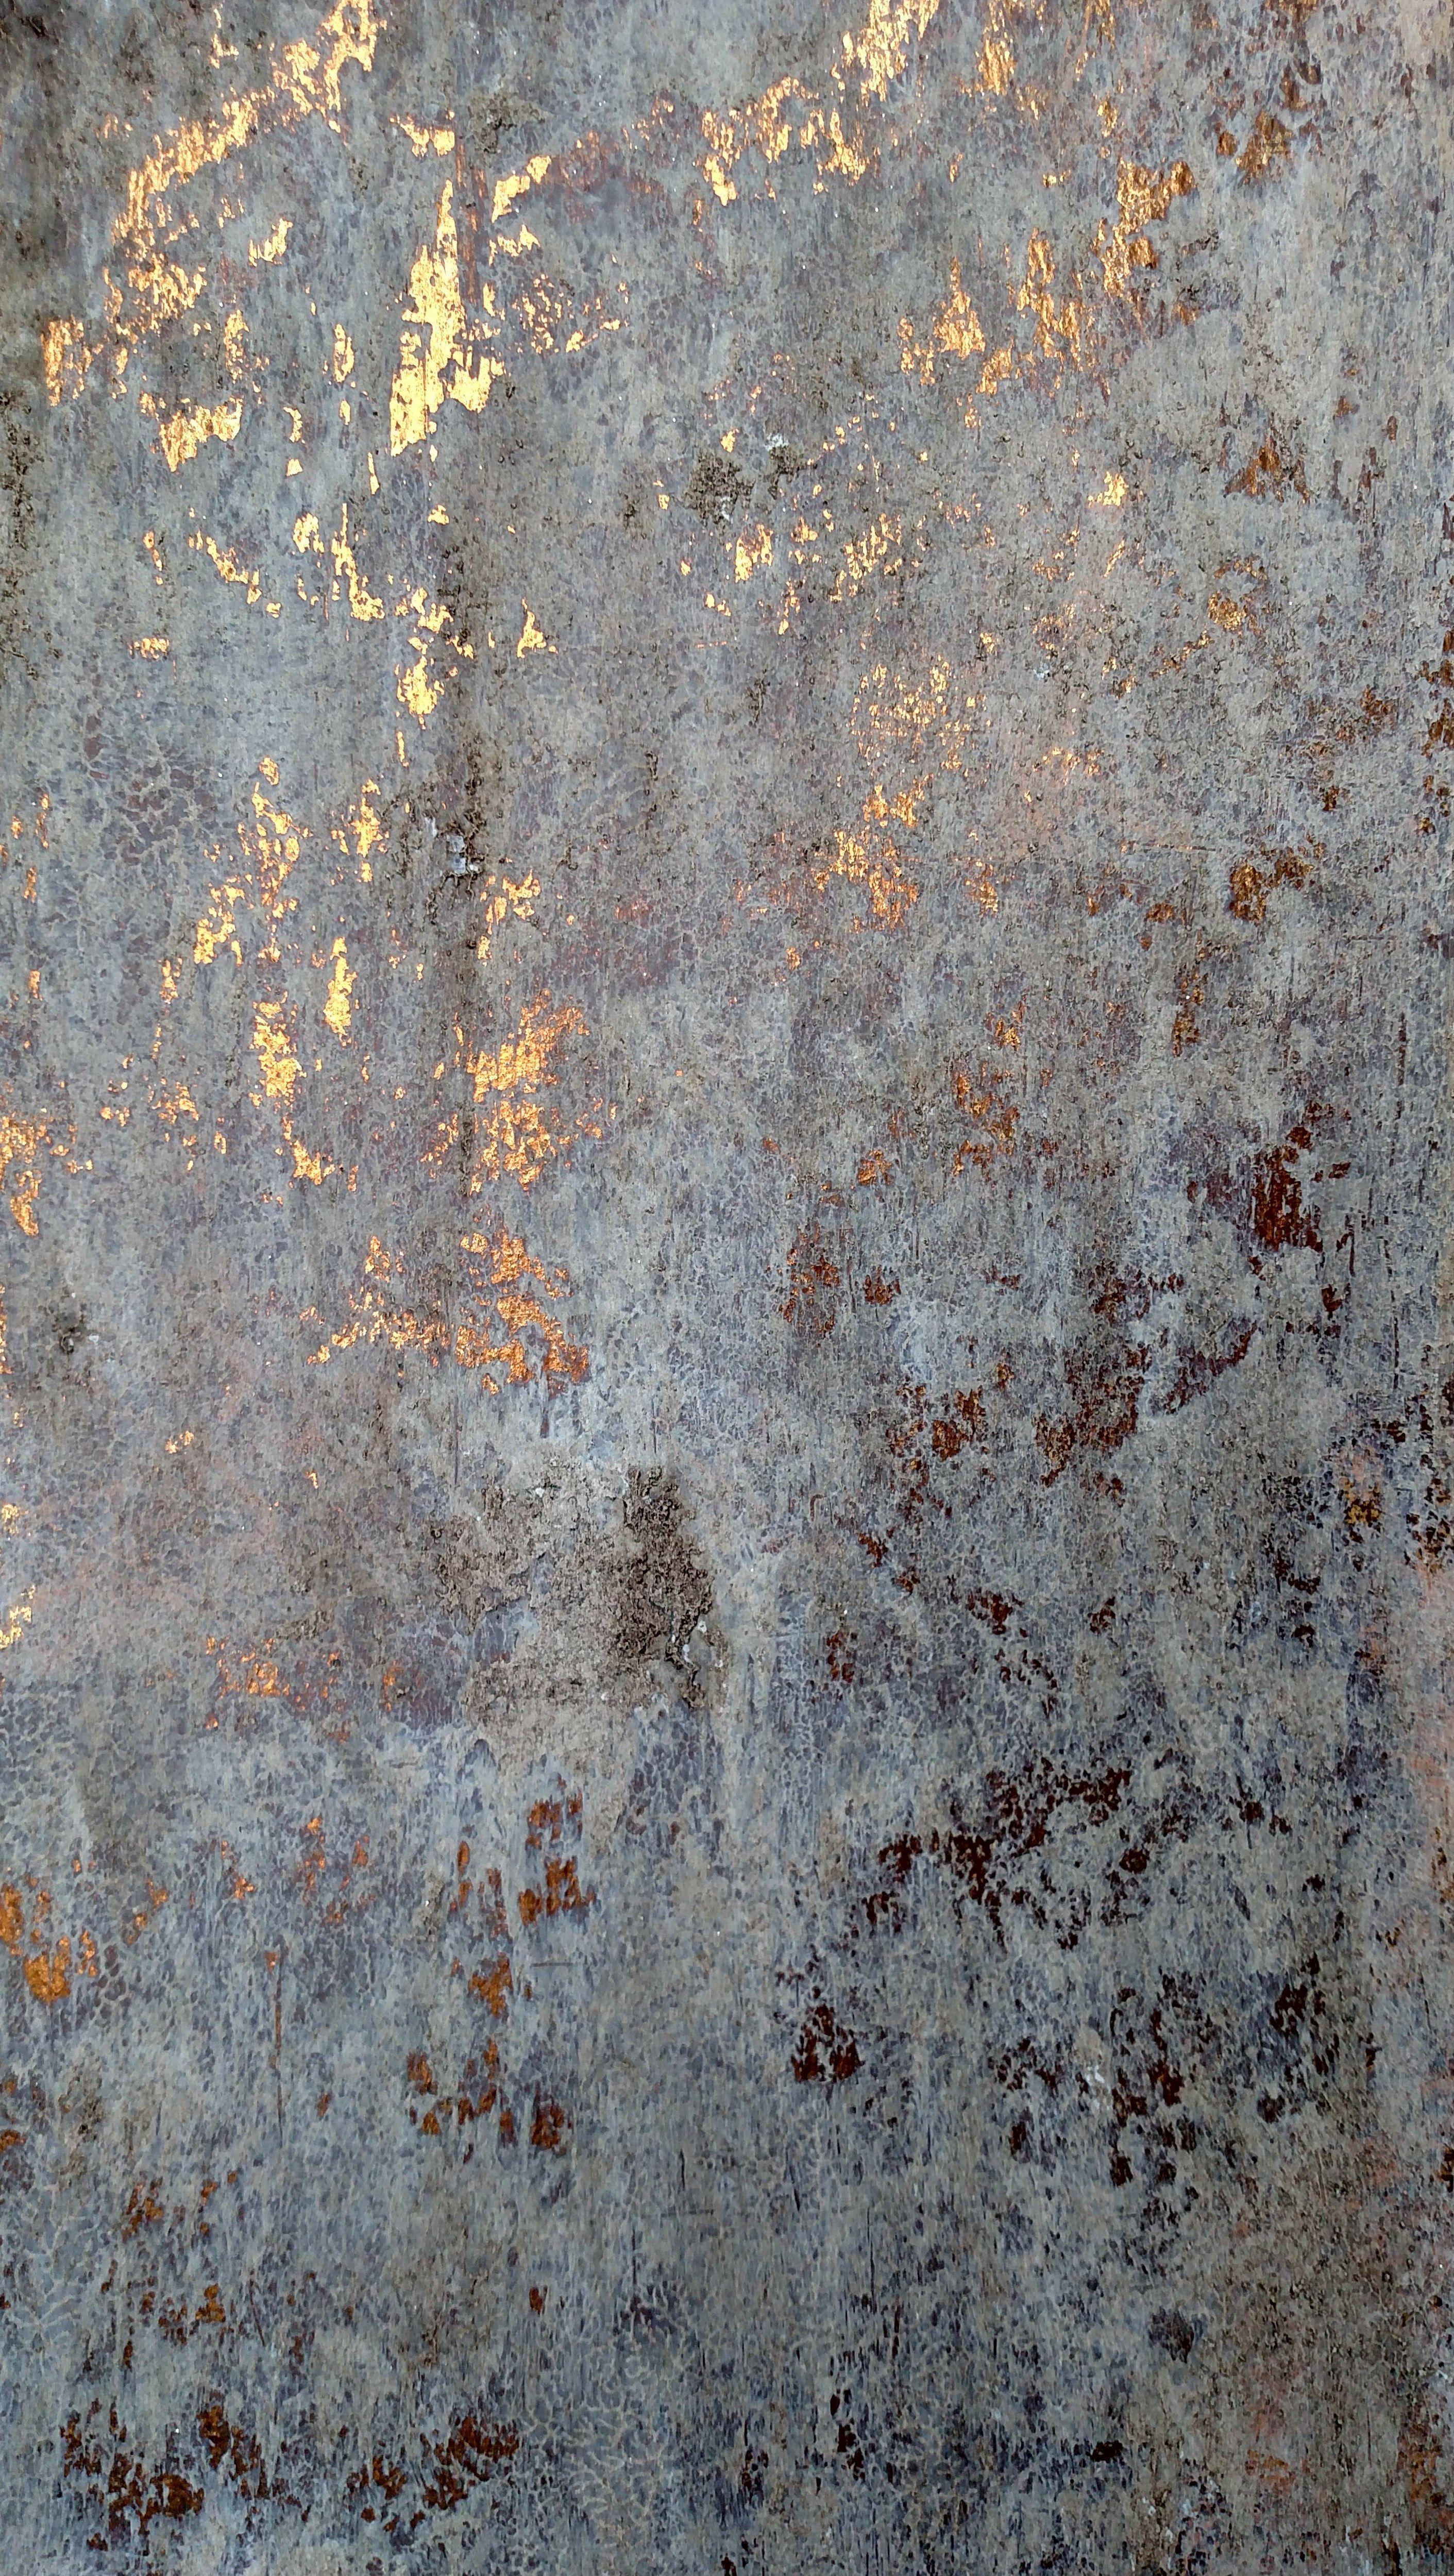 Metal Iphone Wallpapers Top Free Metal Iphone Backgrounds